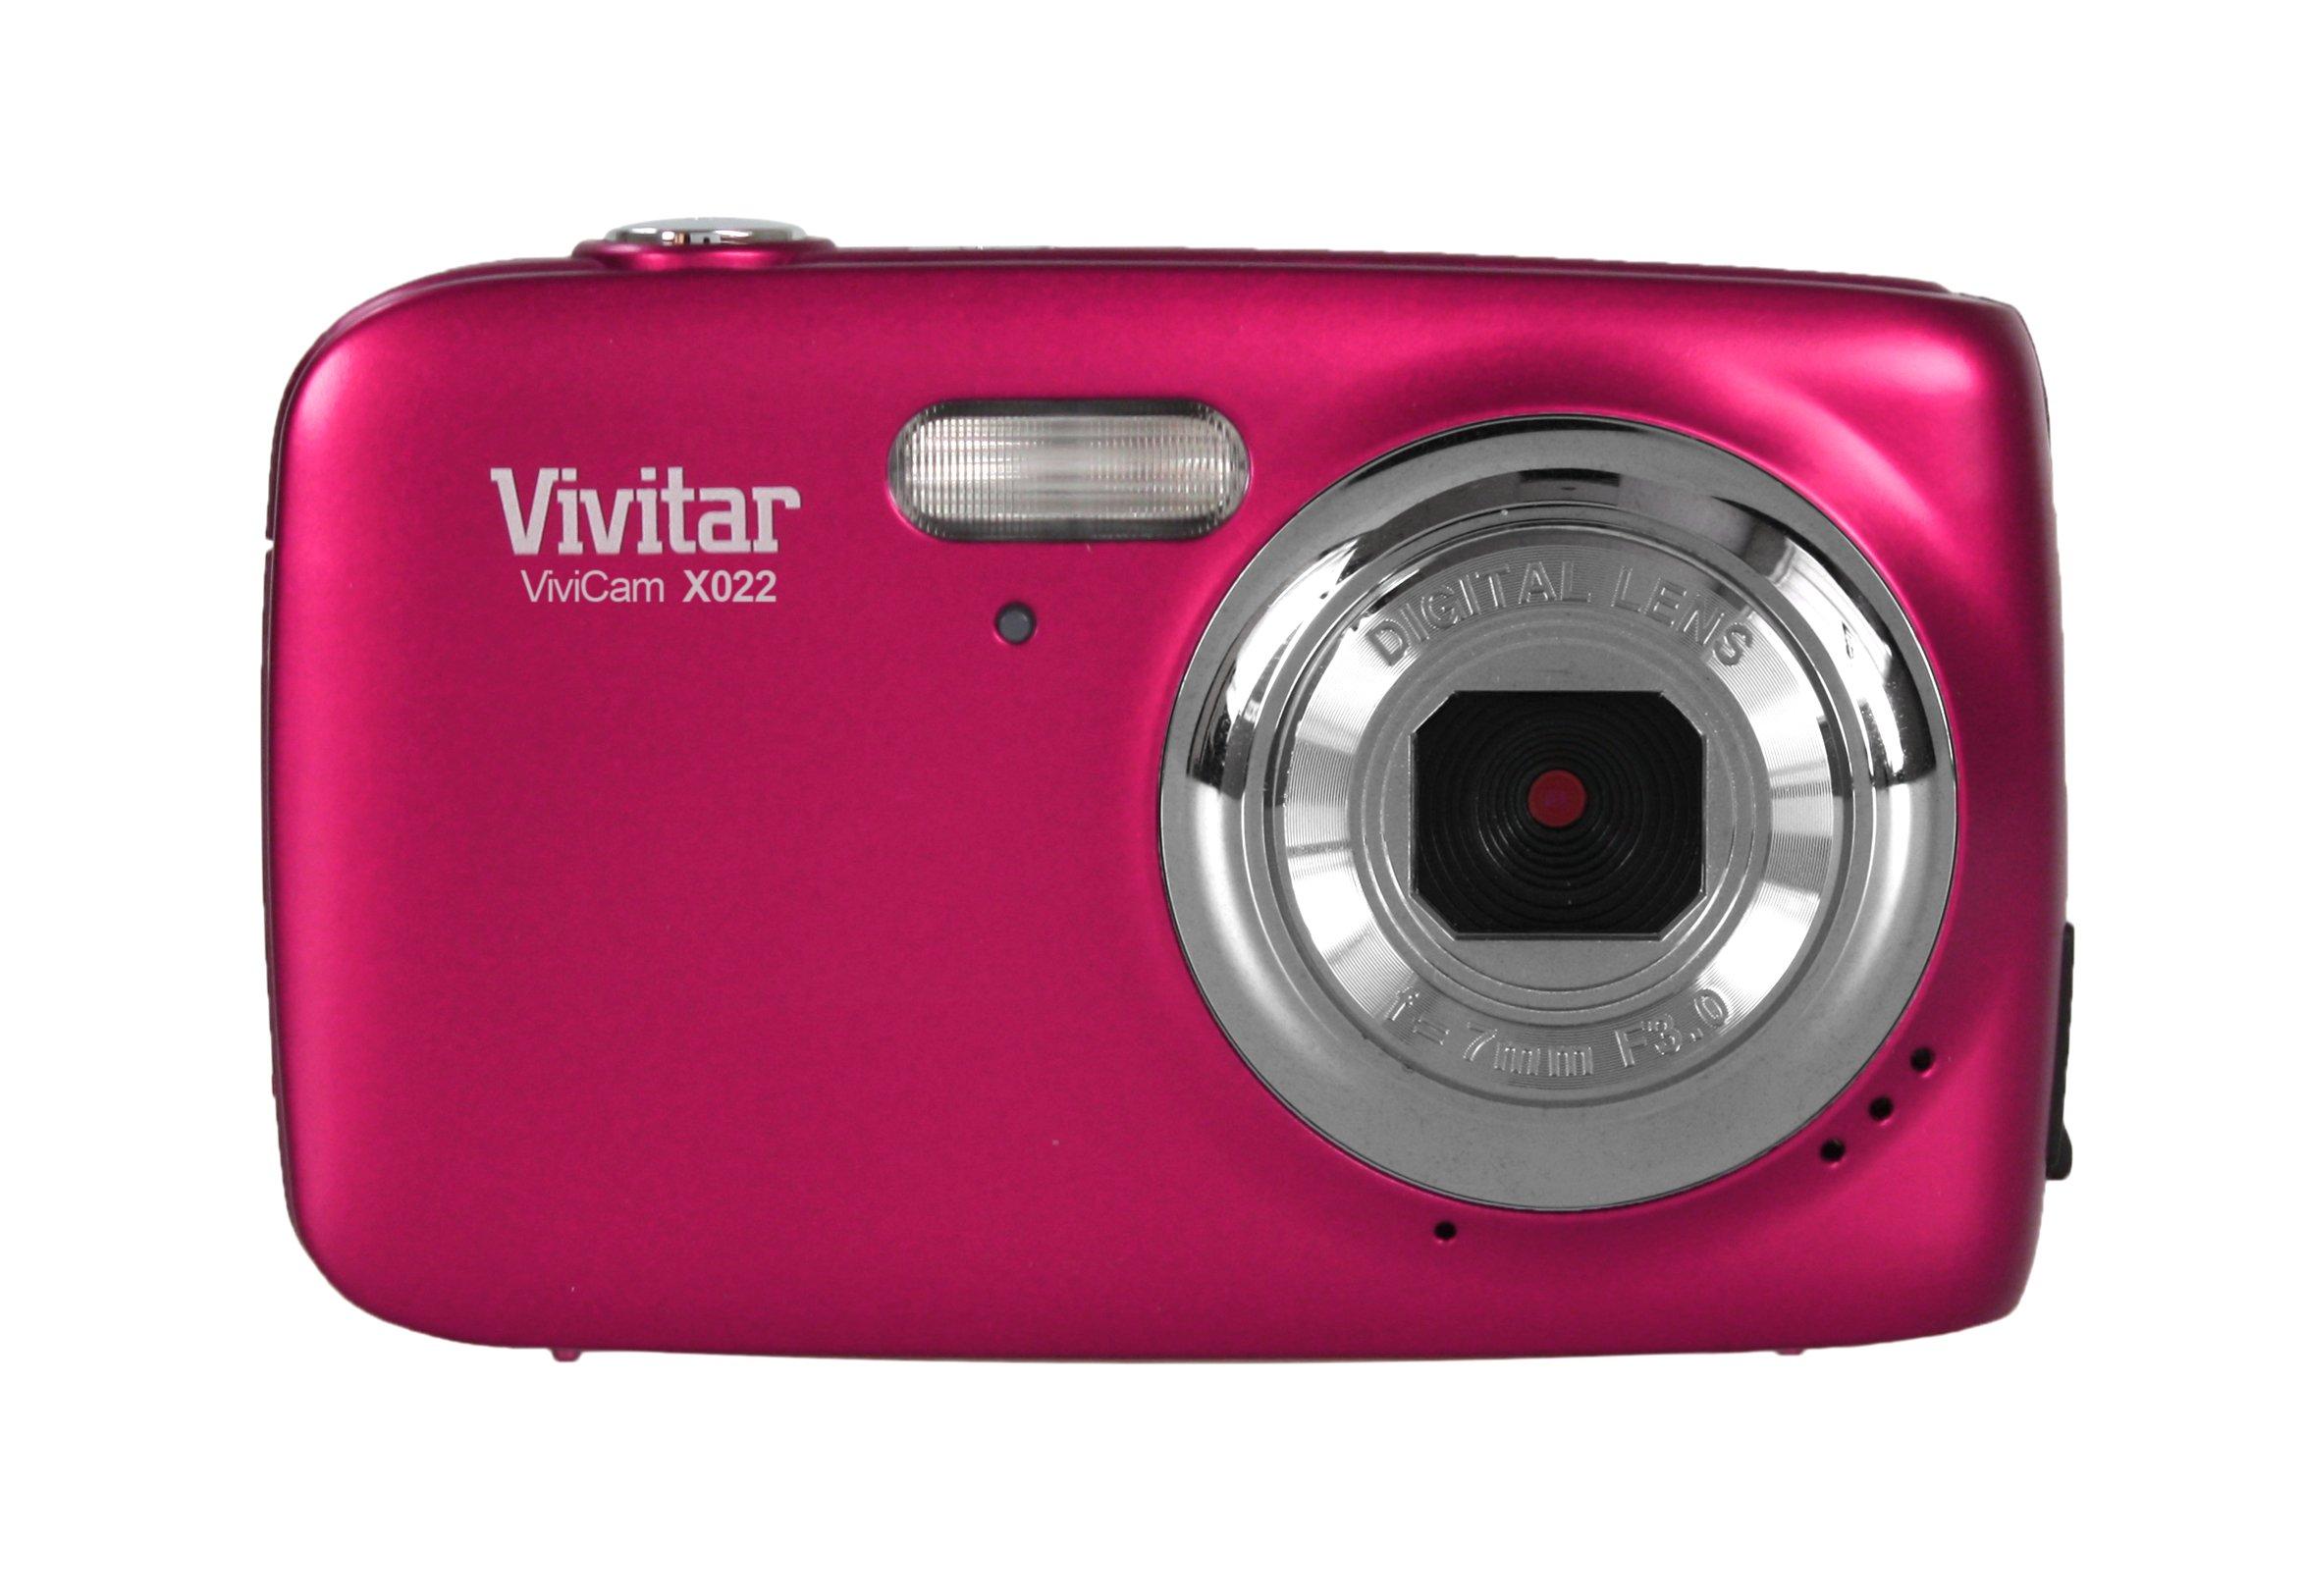 VIVITAR VX022-PNK 10.1 Megapixel VX022 Digital Camera (Pink) by Vivitar